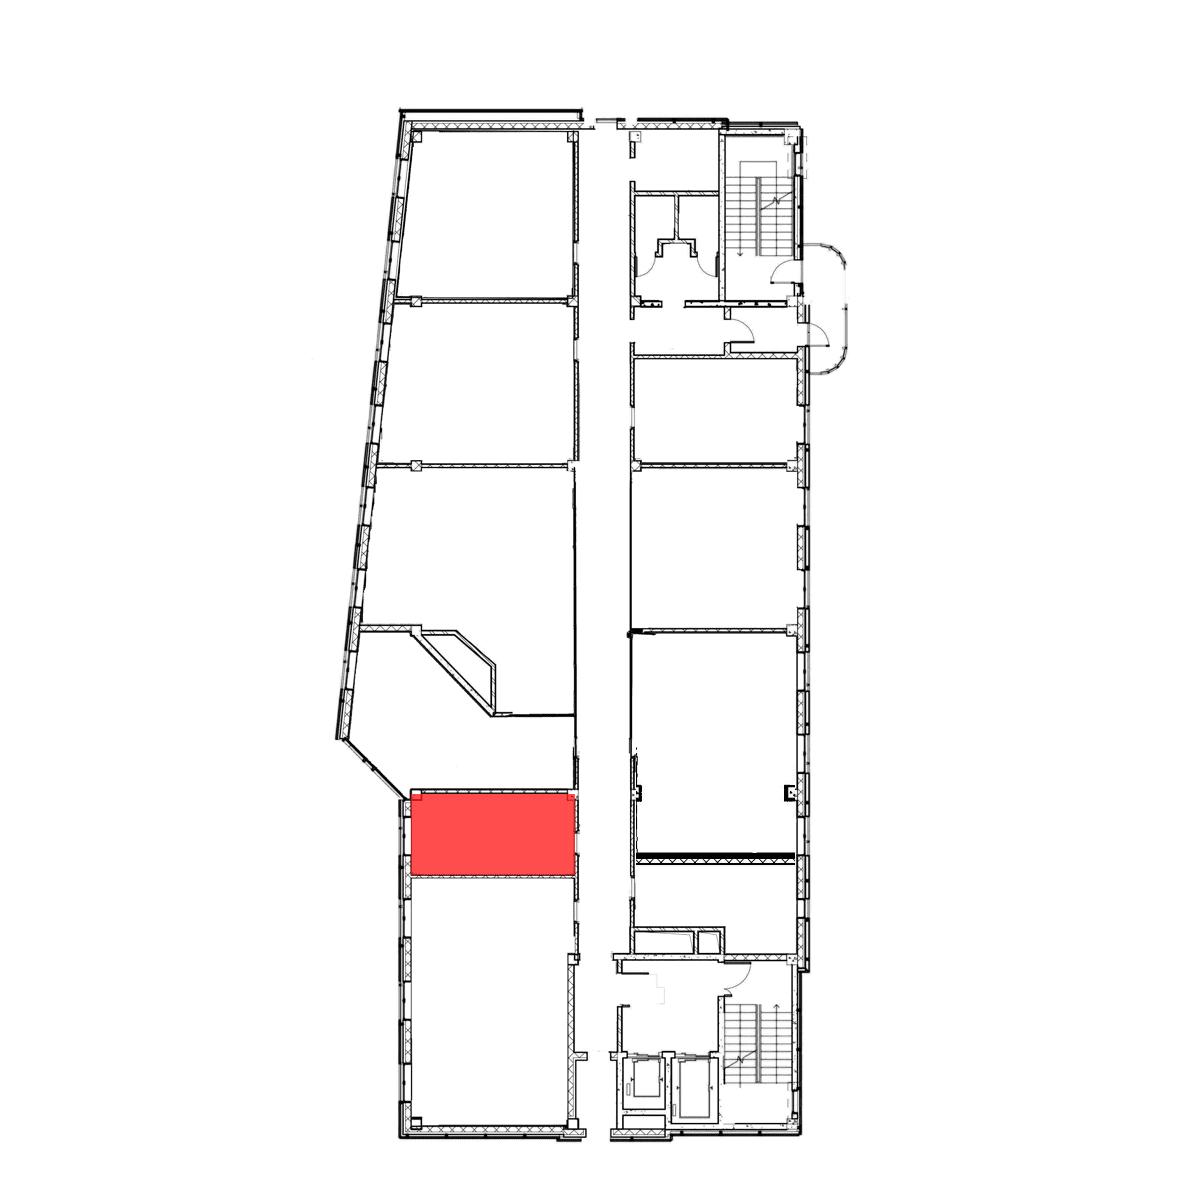 БЦ Галерея Тамбов аренда офиса 6 этаж 20м